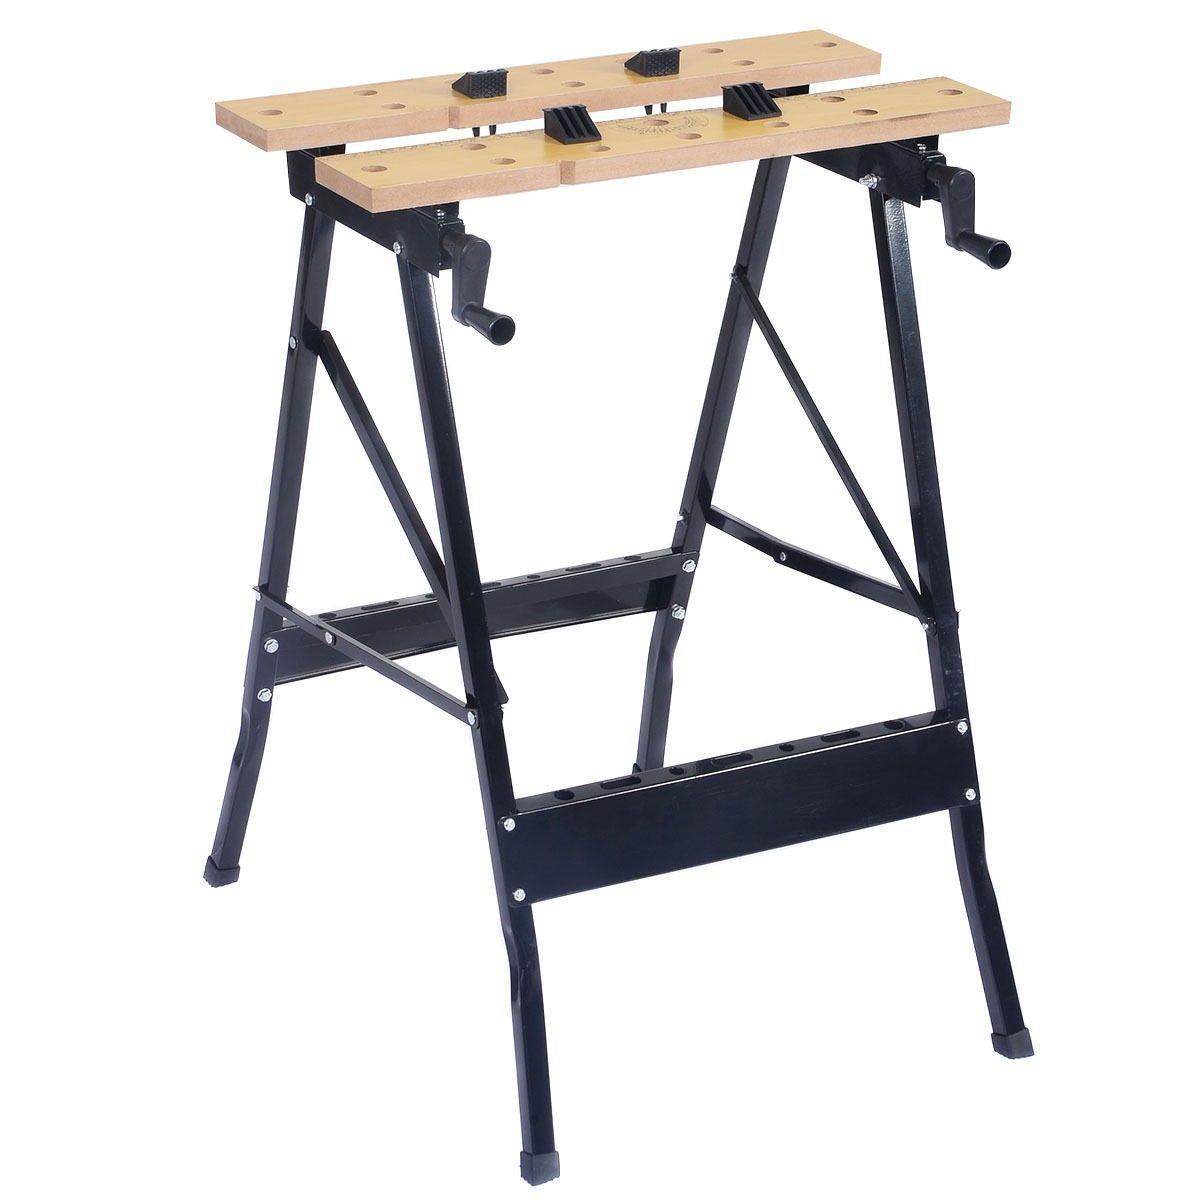 folding work bench table tool garage repair workshop benches